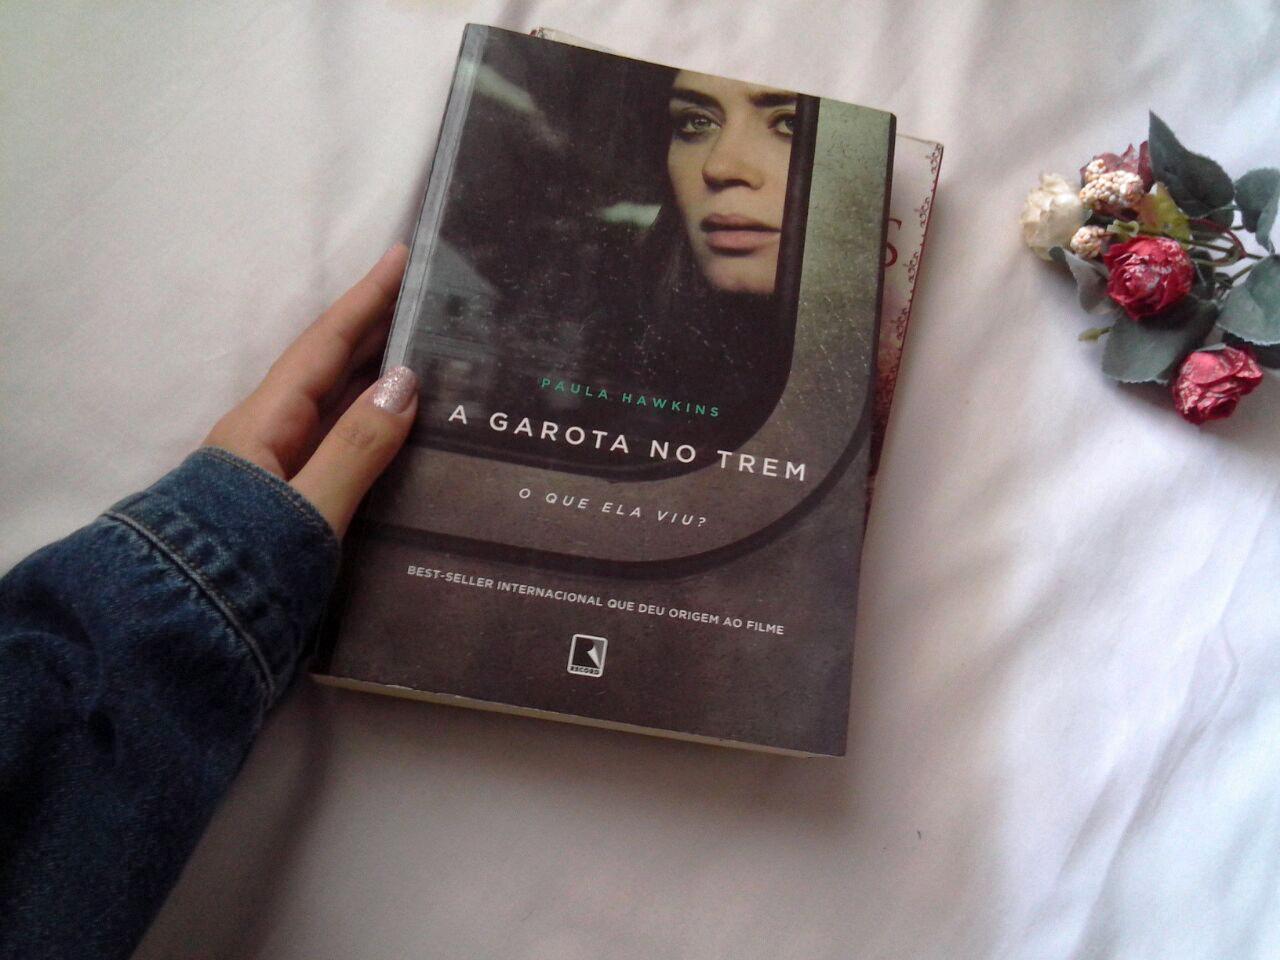 Resenha | A garota no trem - Paula Hawkins